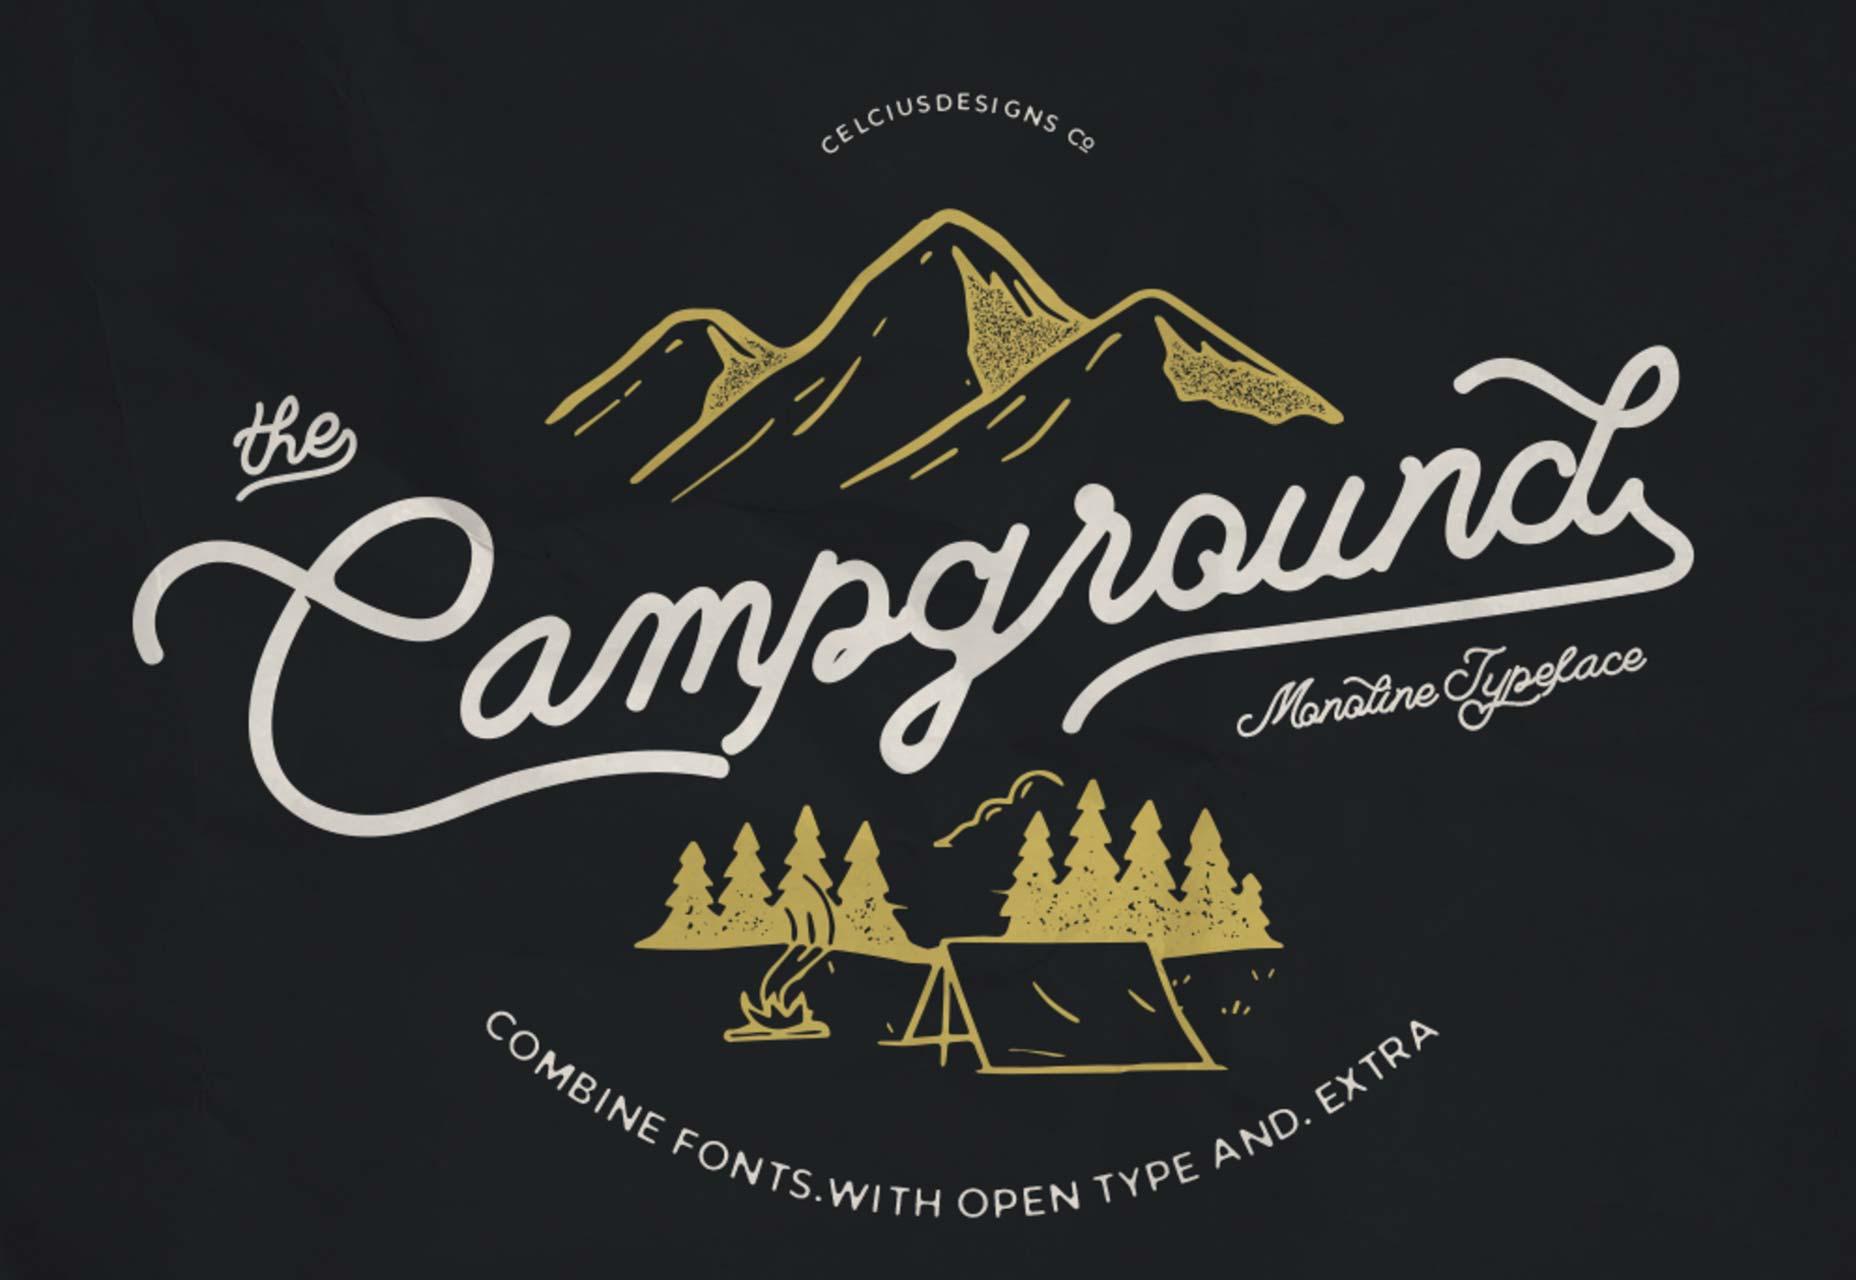 terreno de camping